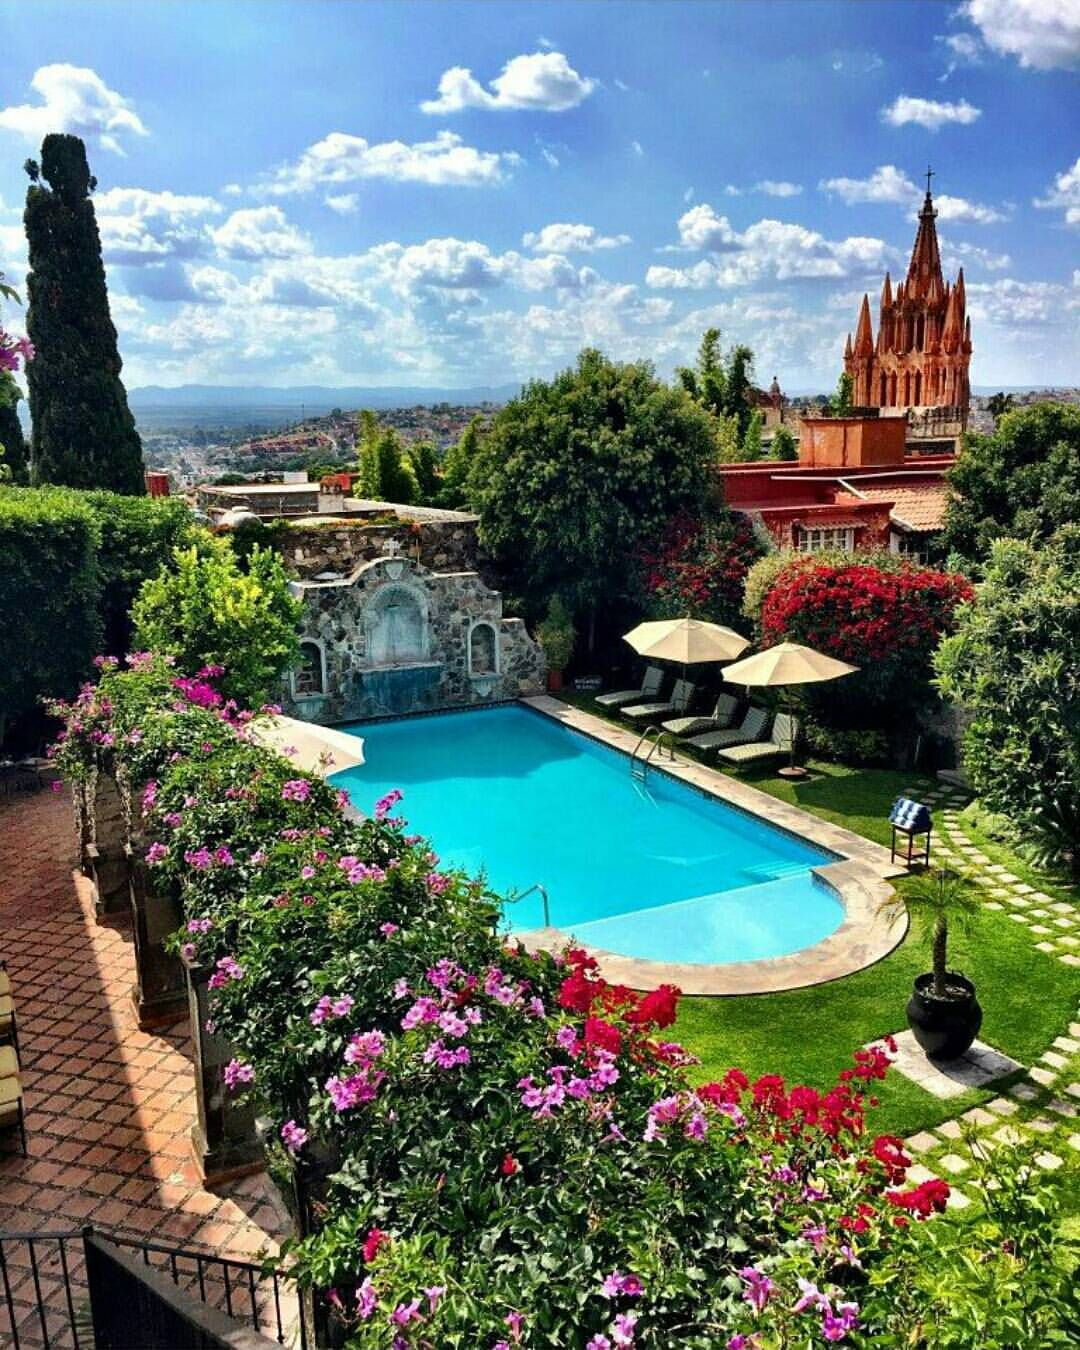 The Dream Hotel On Instagram Belmond Casa De Sierra Nevada Mexico Photography By Carlosmeliab San Miguel De Allende San Miguel Allende San Miguel